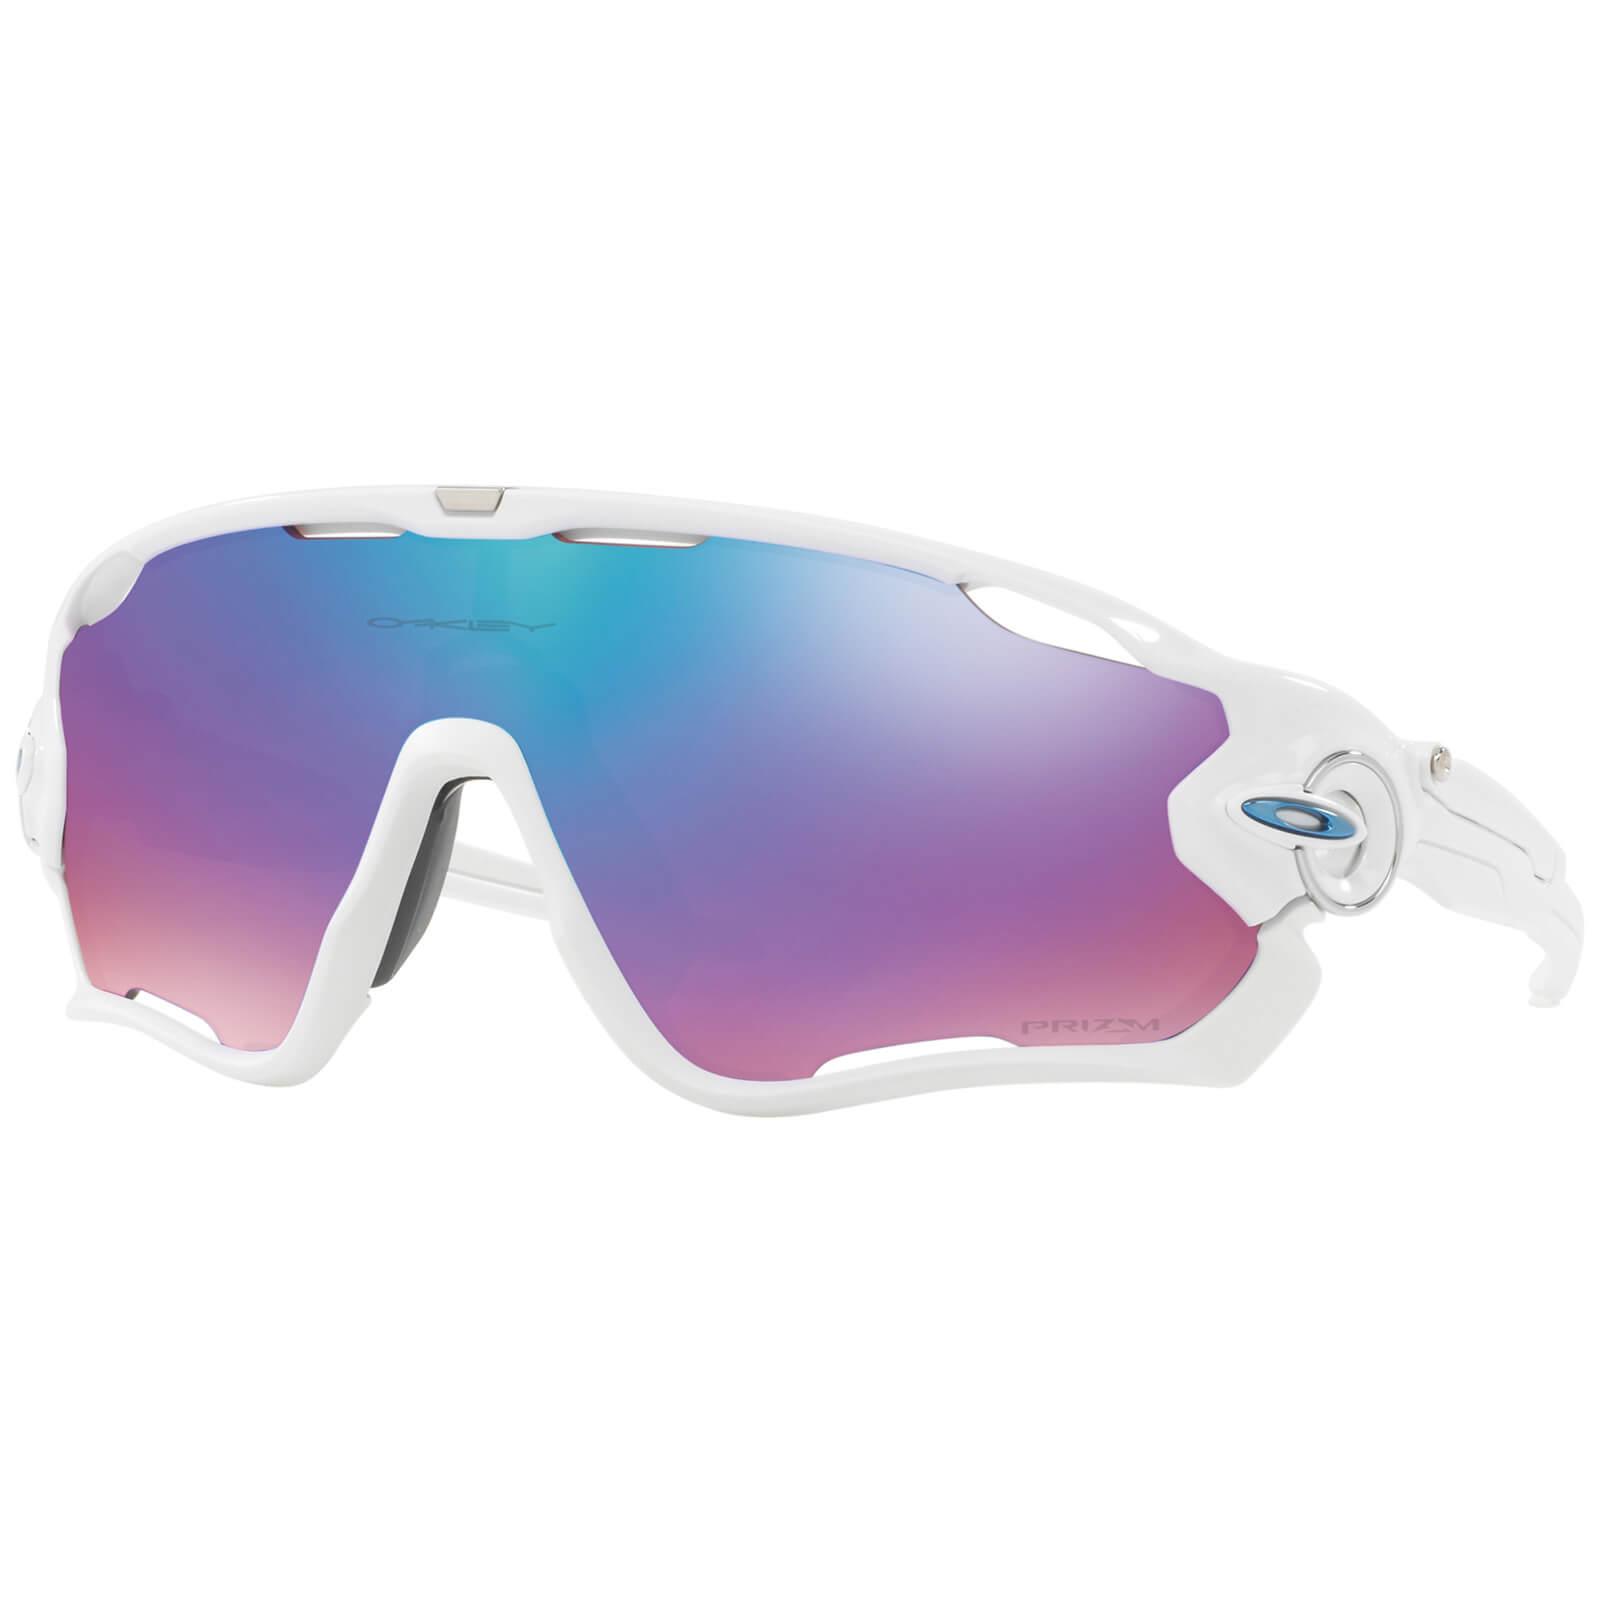 Oakley Jawbreaker Sunglasses - Polished White/Prizm Snow